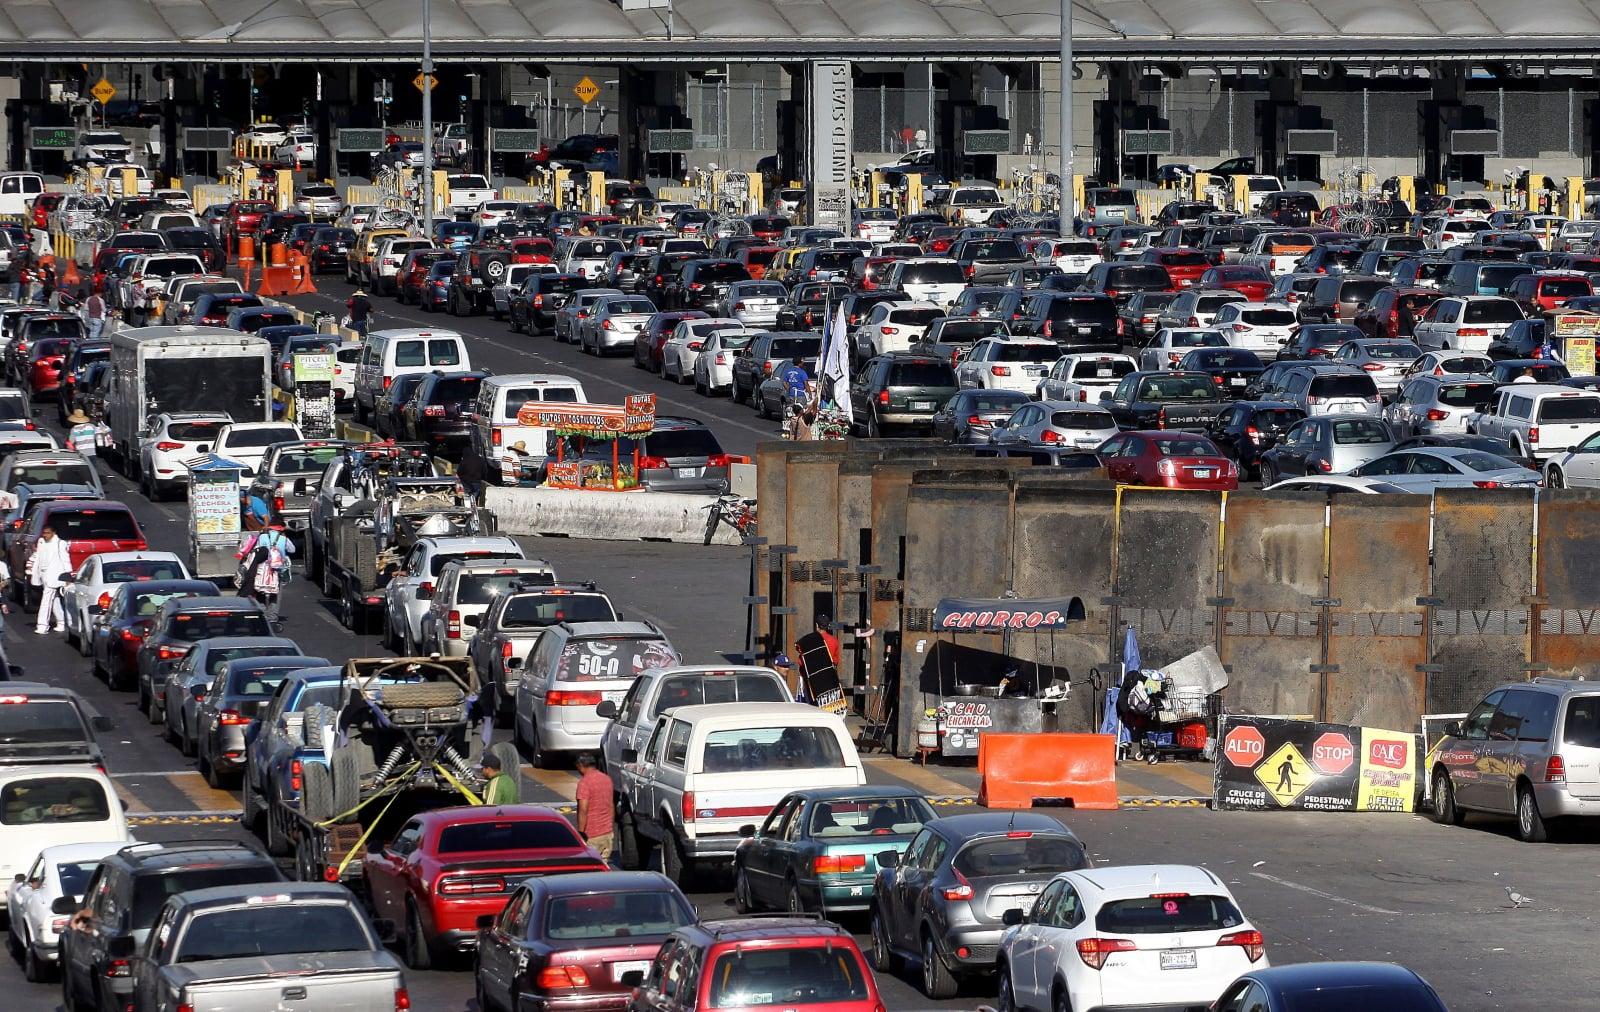 Migranci na granicy z Meksykiem fot. EPA/Alejandro Zepeda